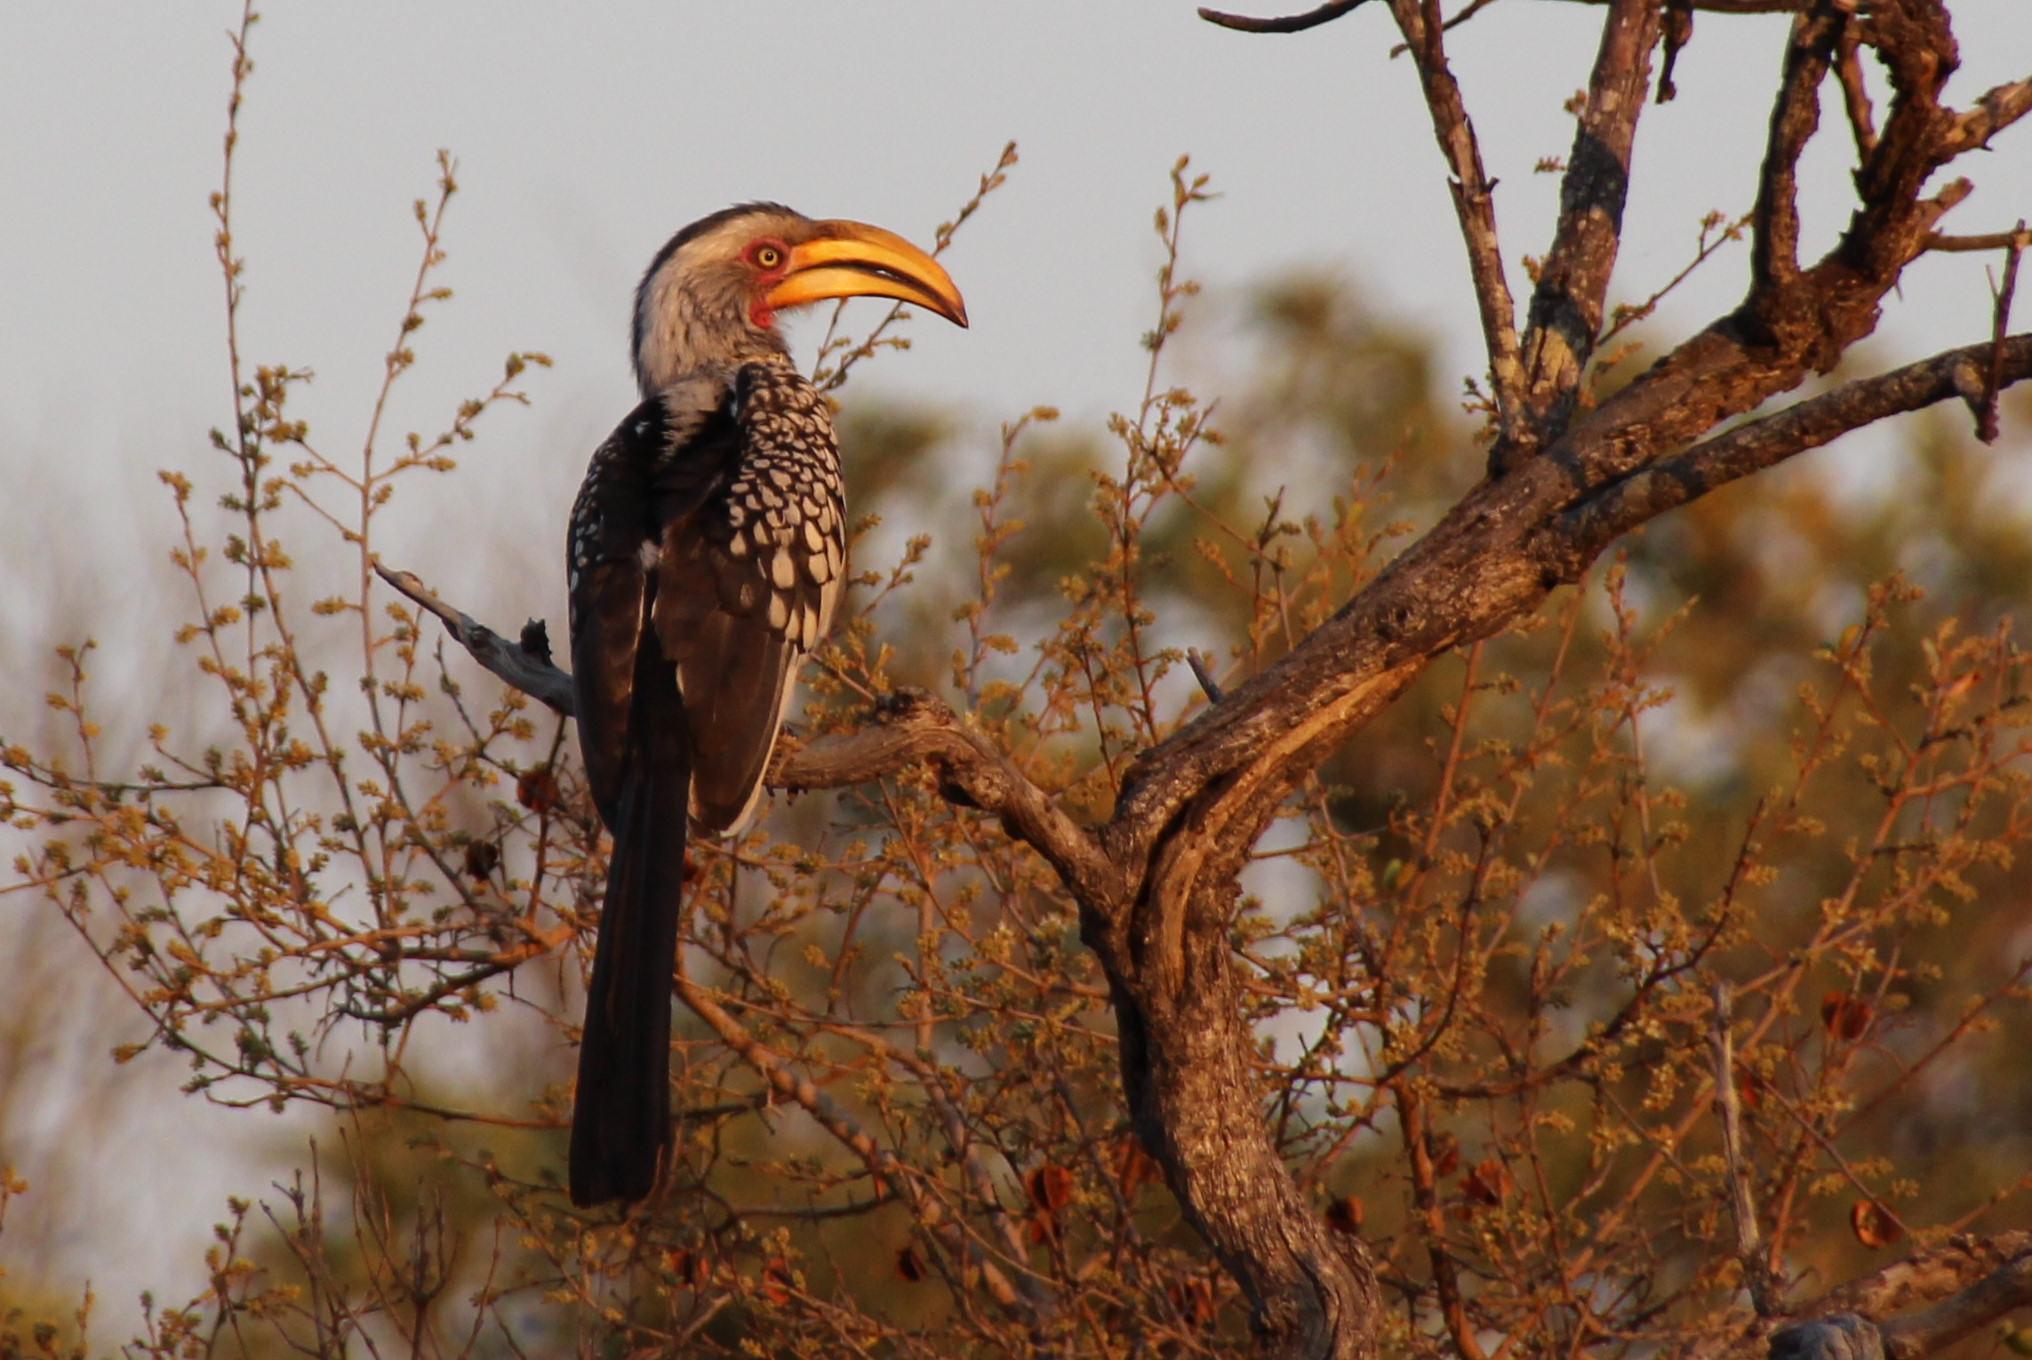 hornbill in Africa